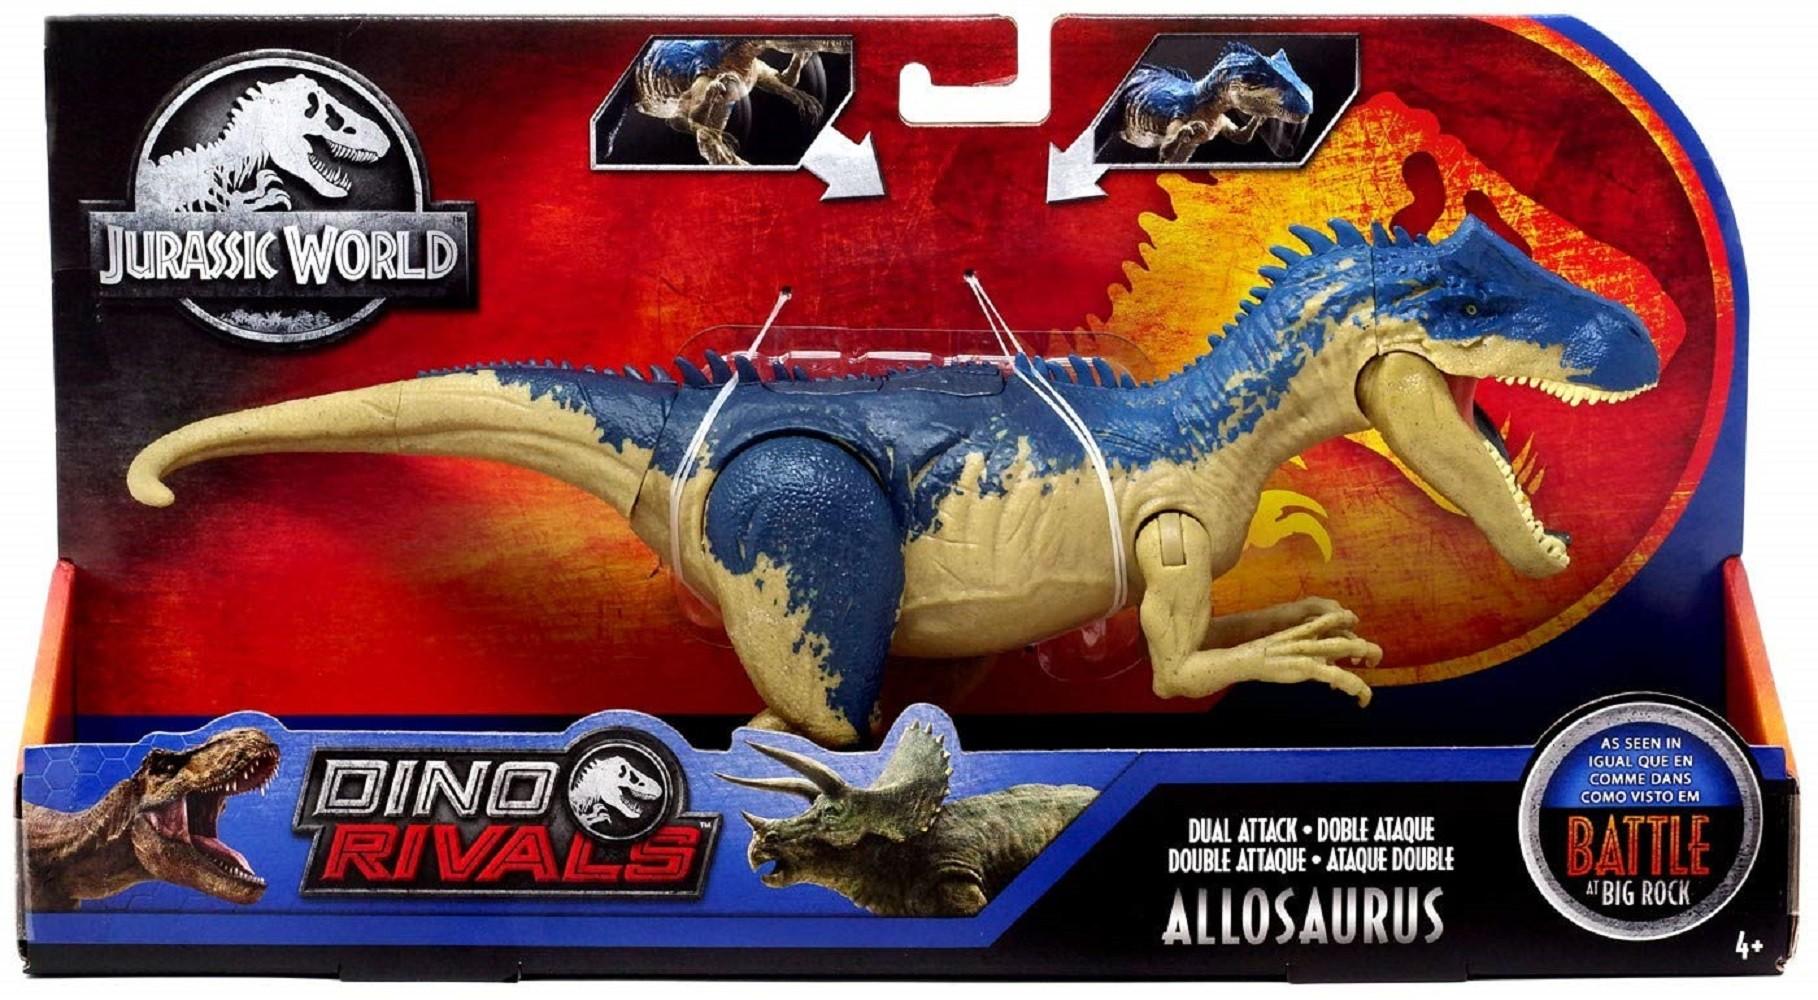 Jurassic World Parasaurolophus Dino Rivaux double attaque Dinosaur Figure